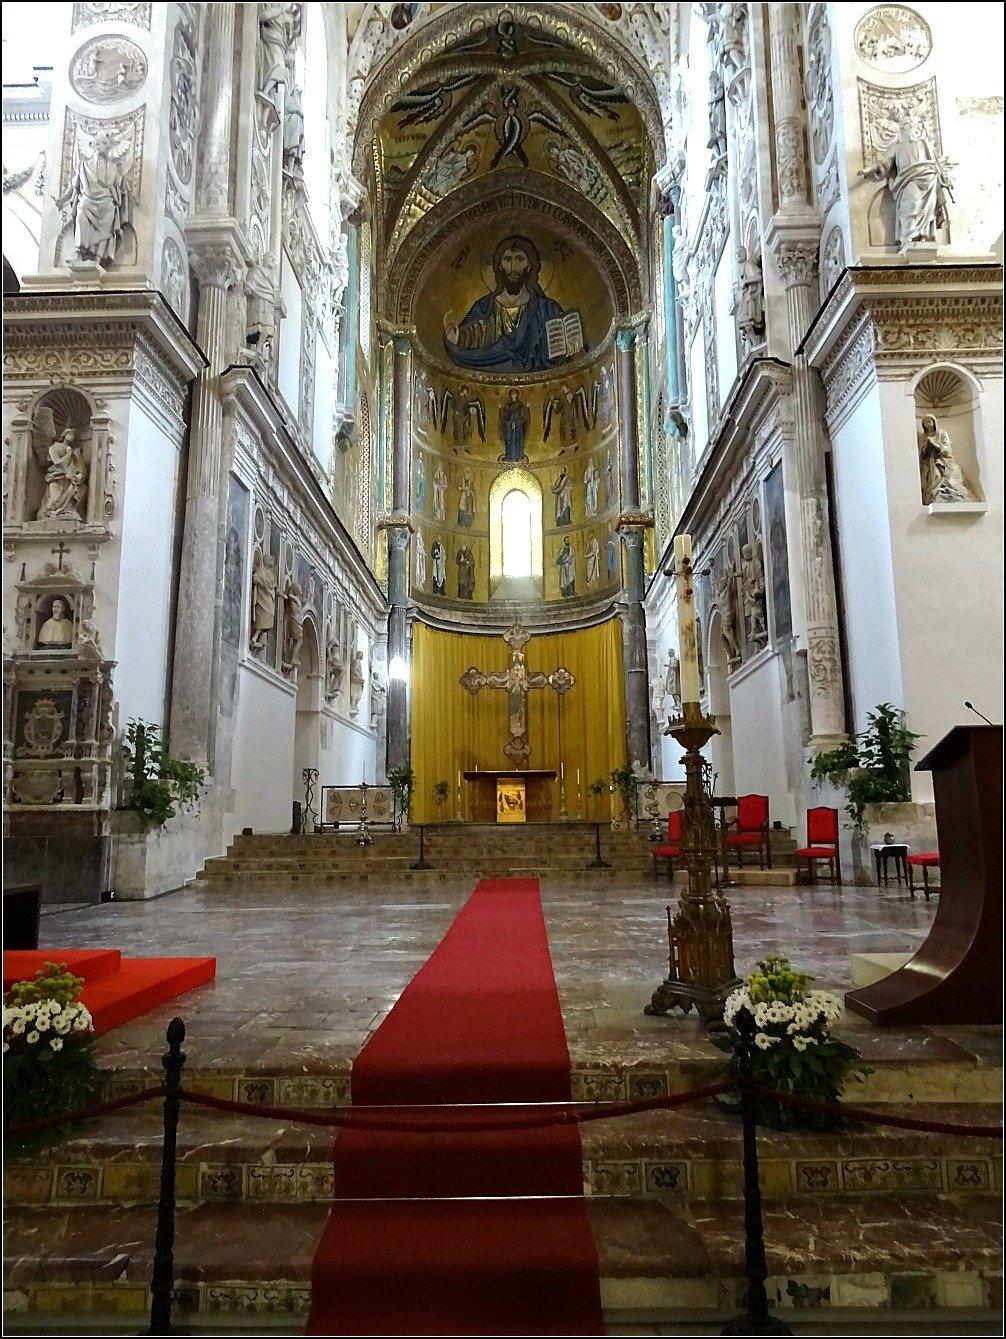 Cefalu Duomo Mosaics, Sicily